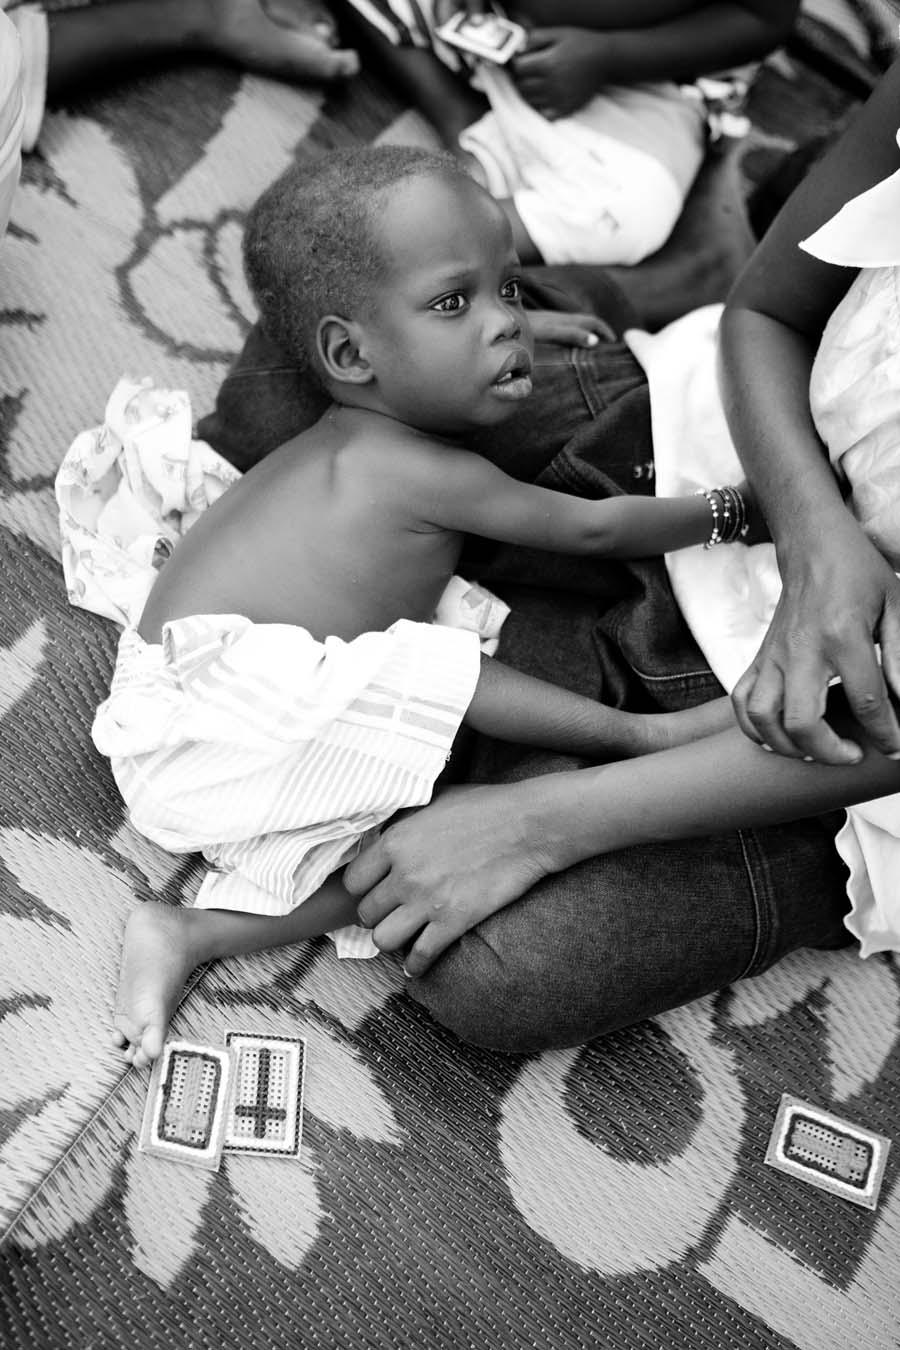 jessicadavisphotography.com | Jessica Davis Photography | Portrait Work in Uganda| Travel Photographer | World Event Photographs 9.jpg